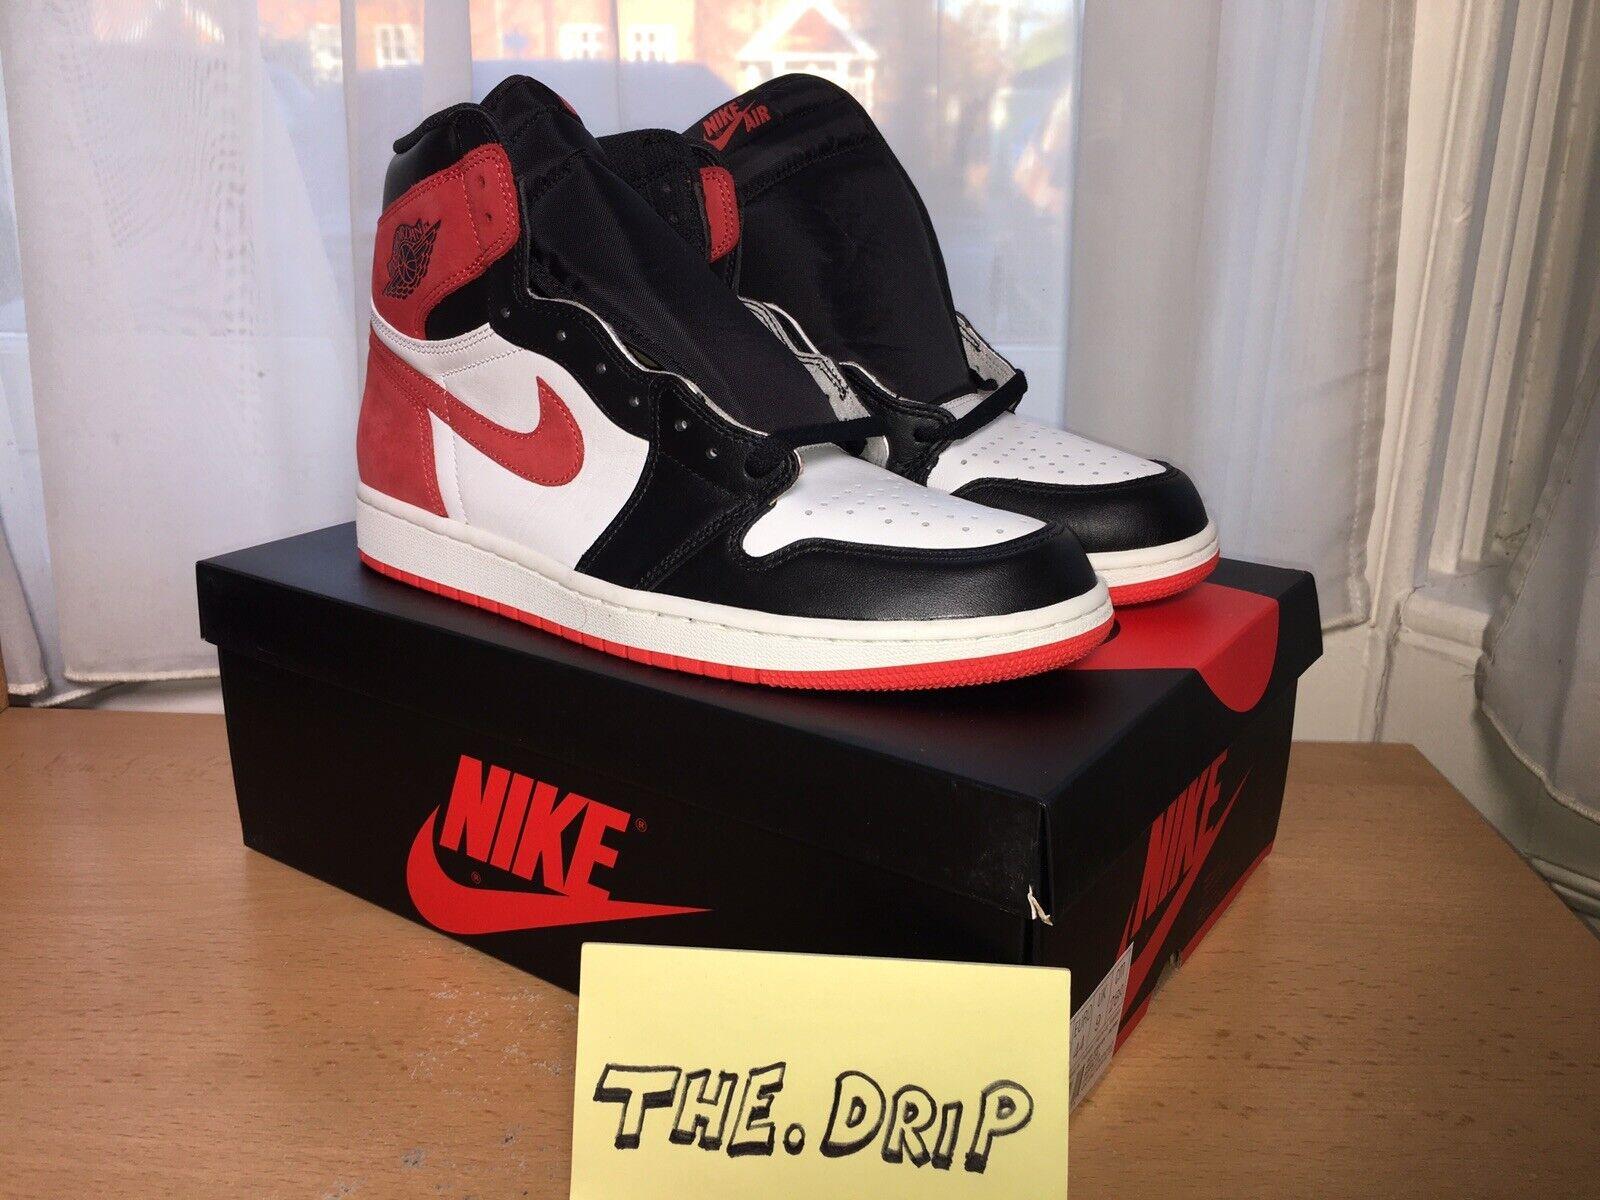 80f7b2fb95 NIKE Air Jordan 1 Retro Hi BHTG Track Red UK9. Nike Air Max 90 ...